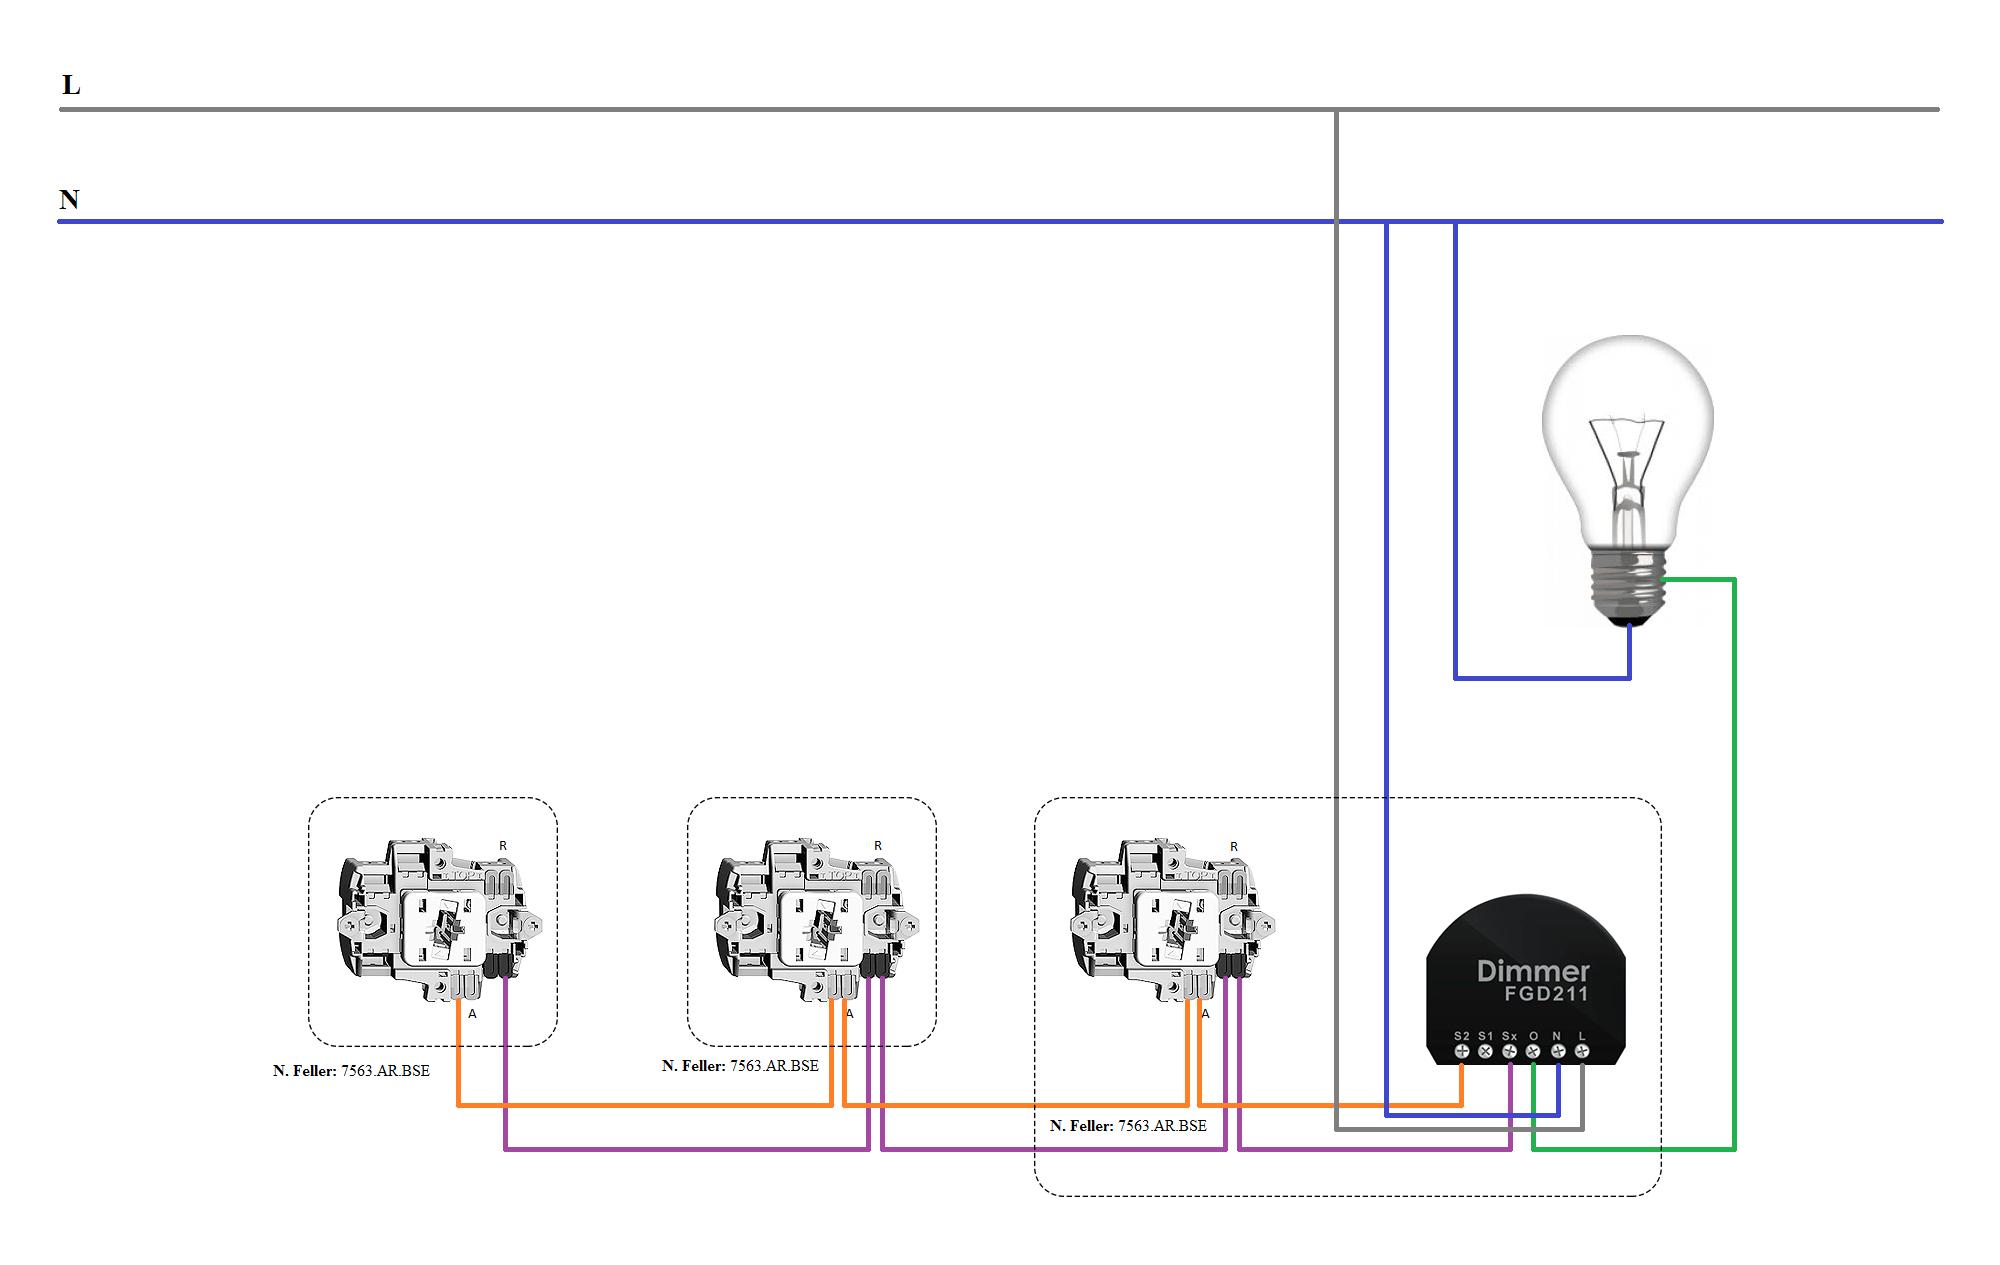 fibaro dimmer 2 wiring - Cerca con Google | Domotica | Pinterest